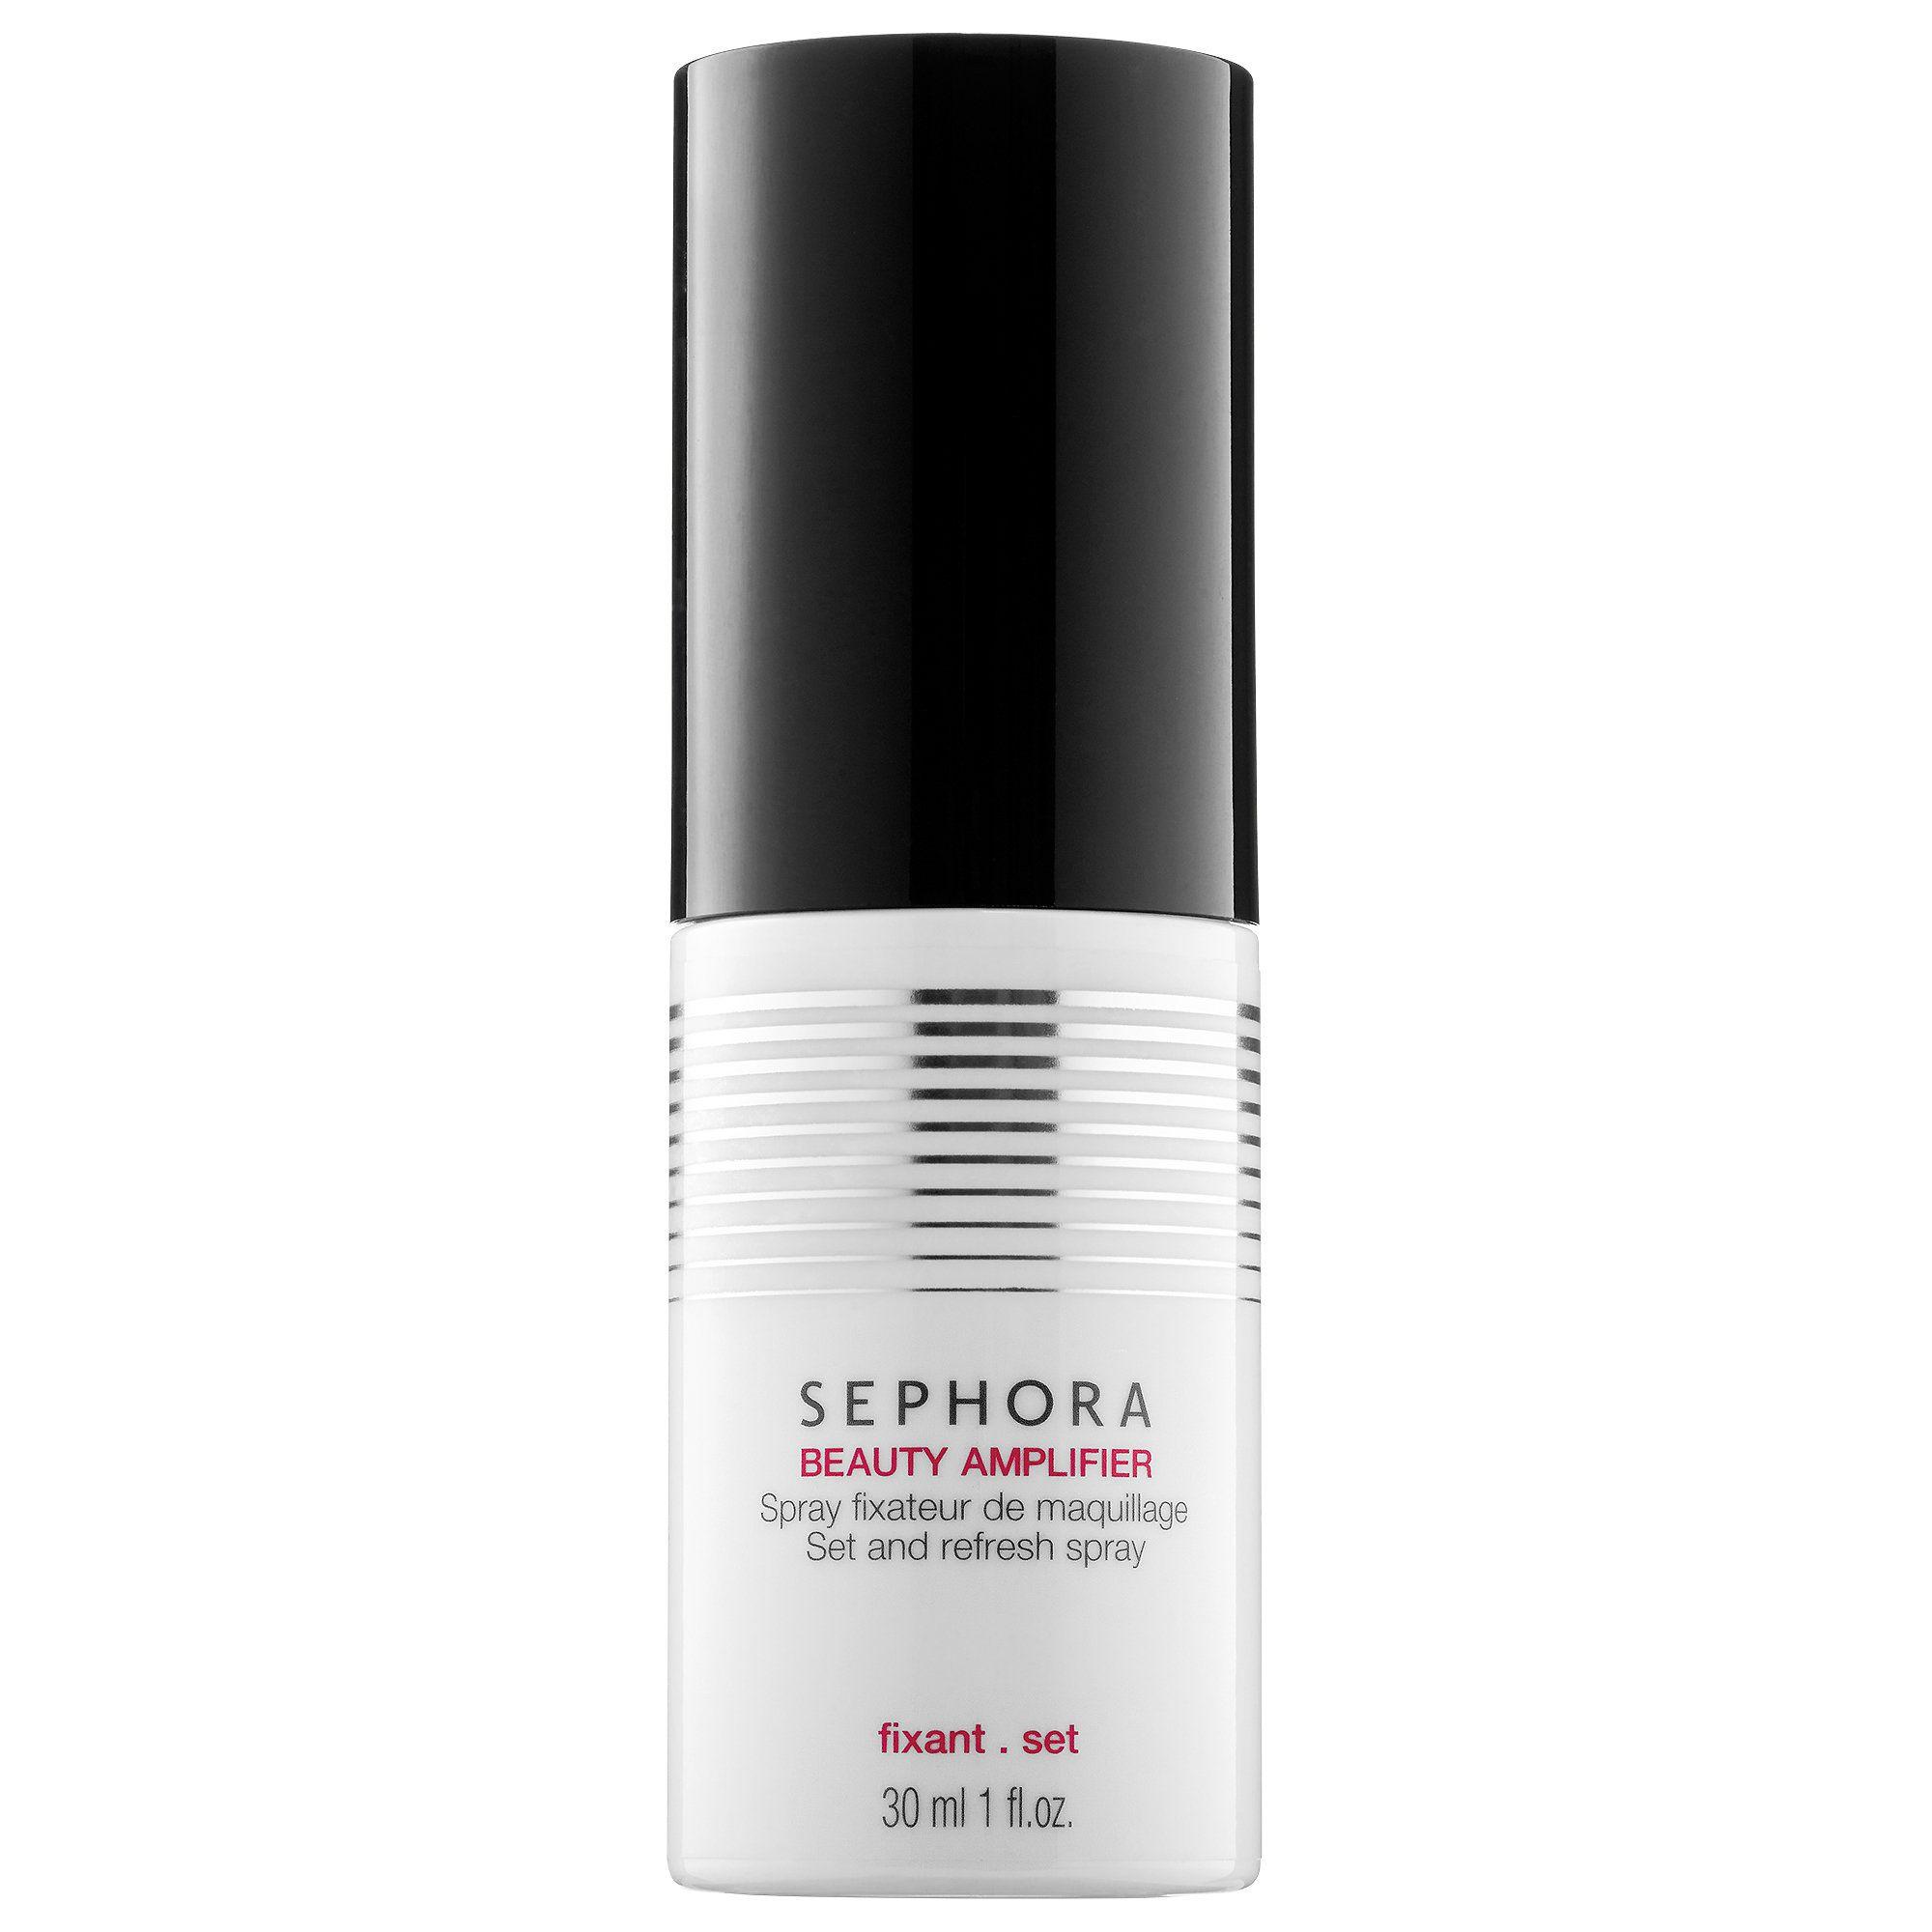 Sephora Perfection Mist Airbrush Foundation Medium NWT